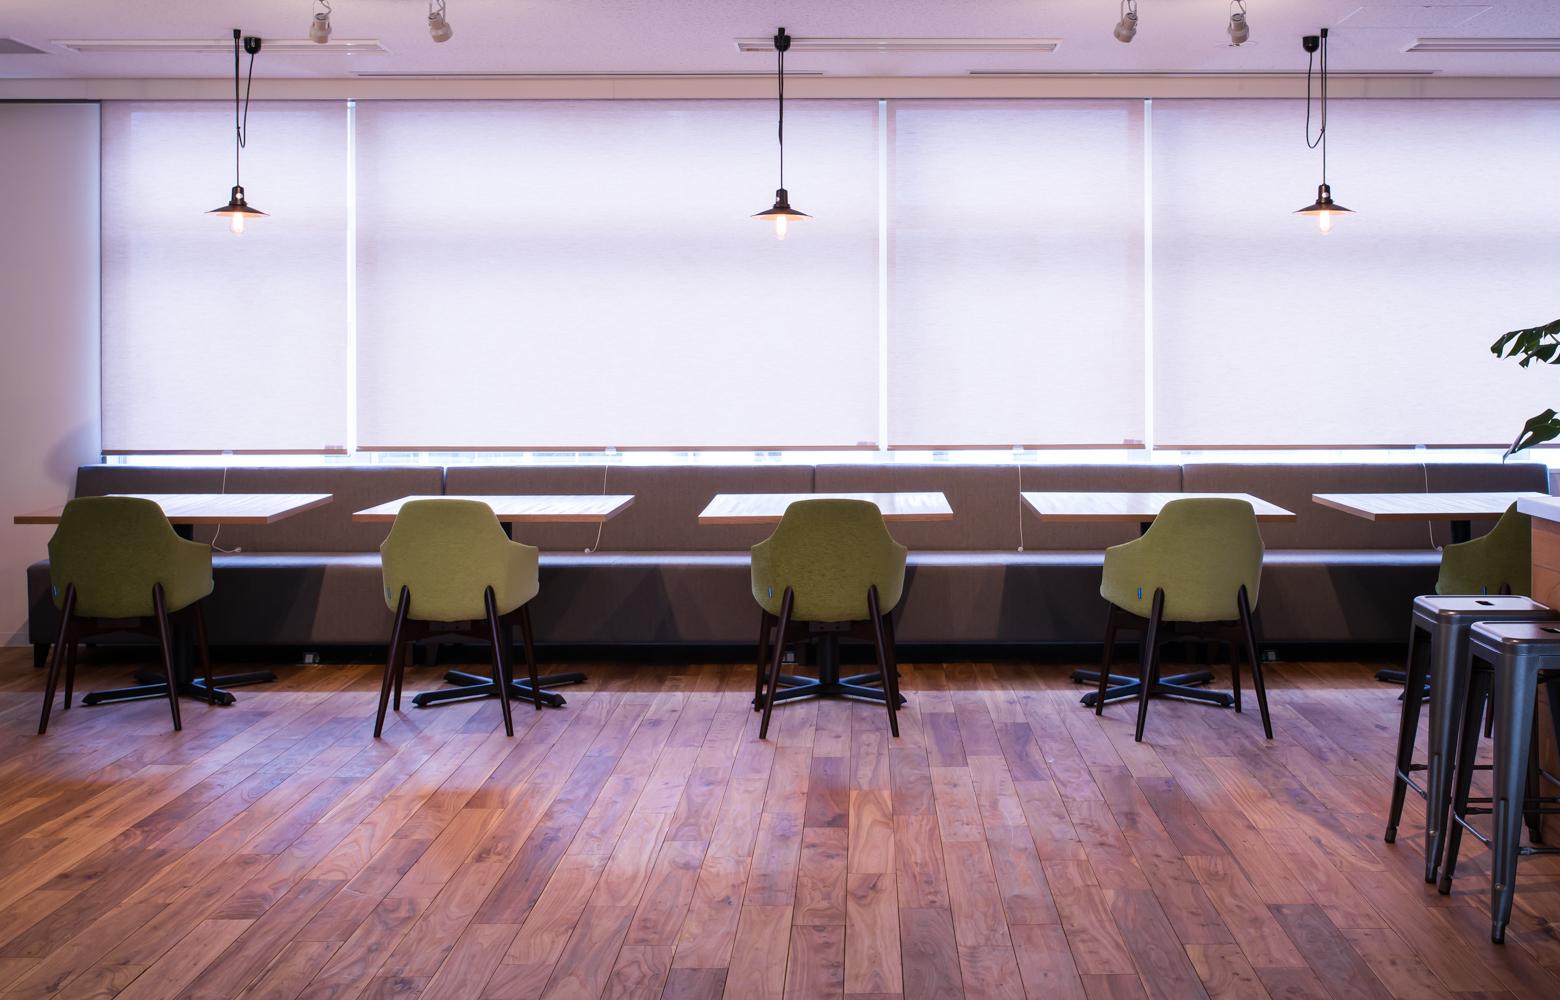 UIEvolution株式会社 vol.2 Table & Chair デザイン・レイアウト事例